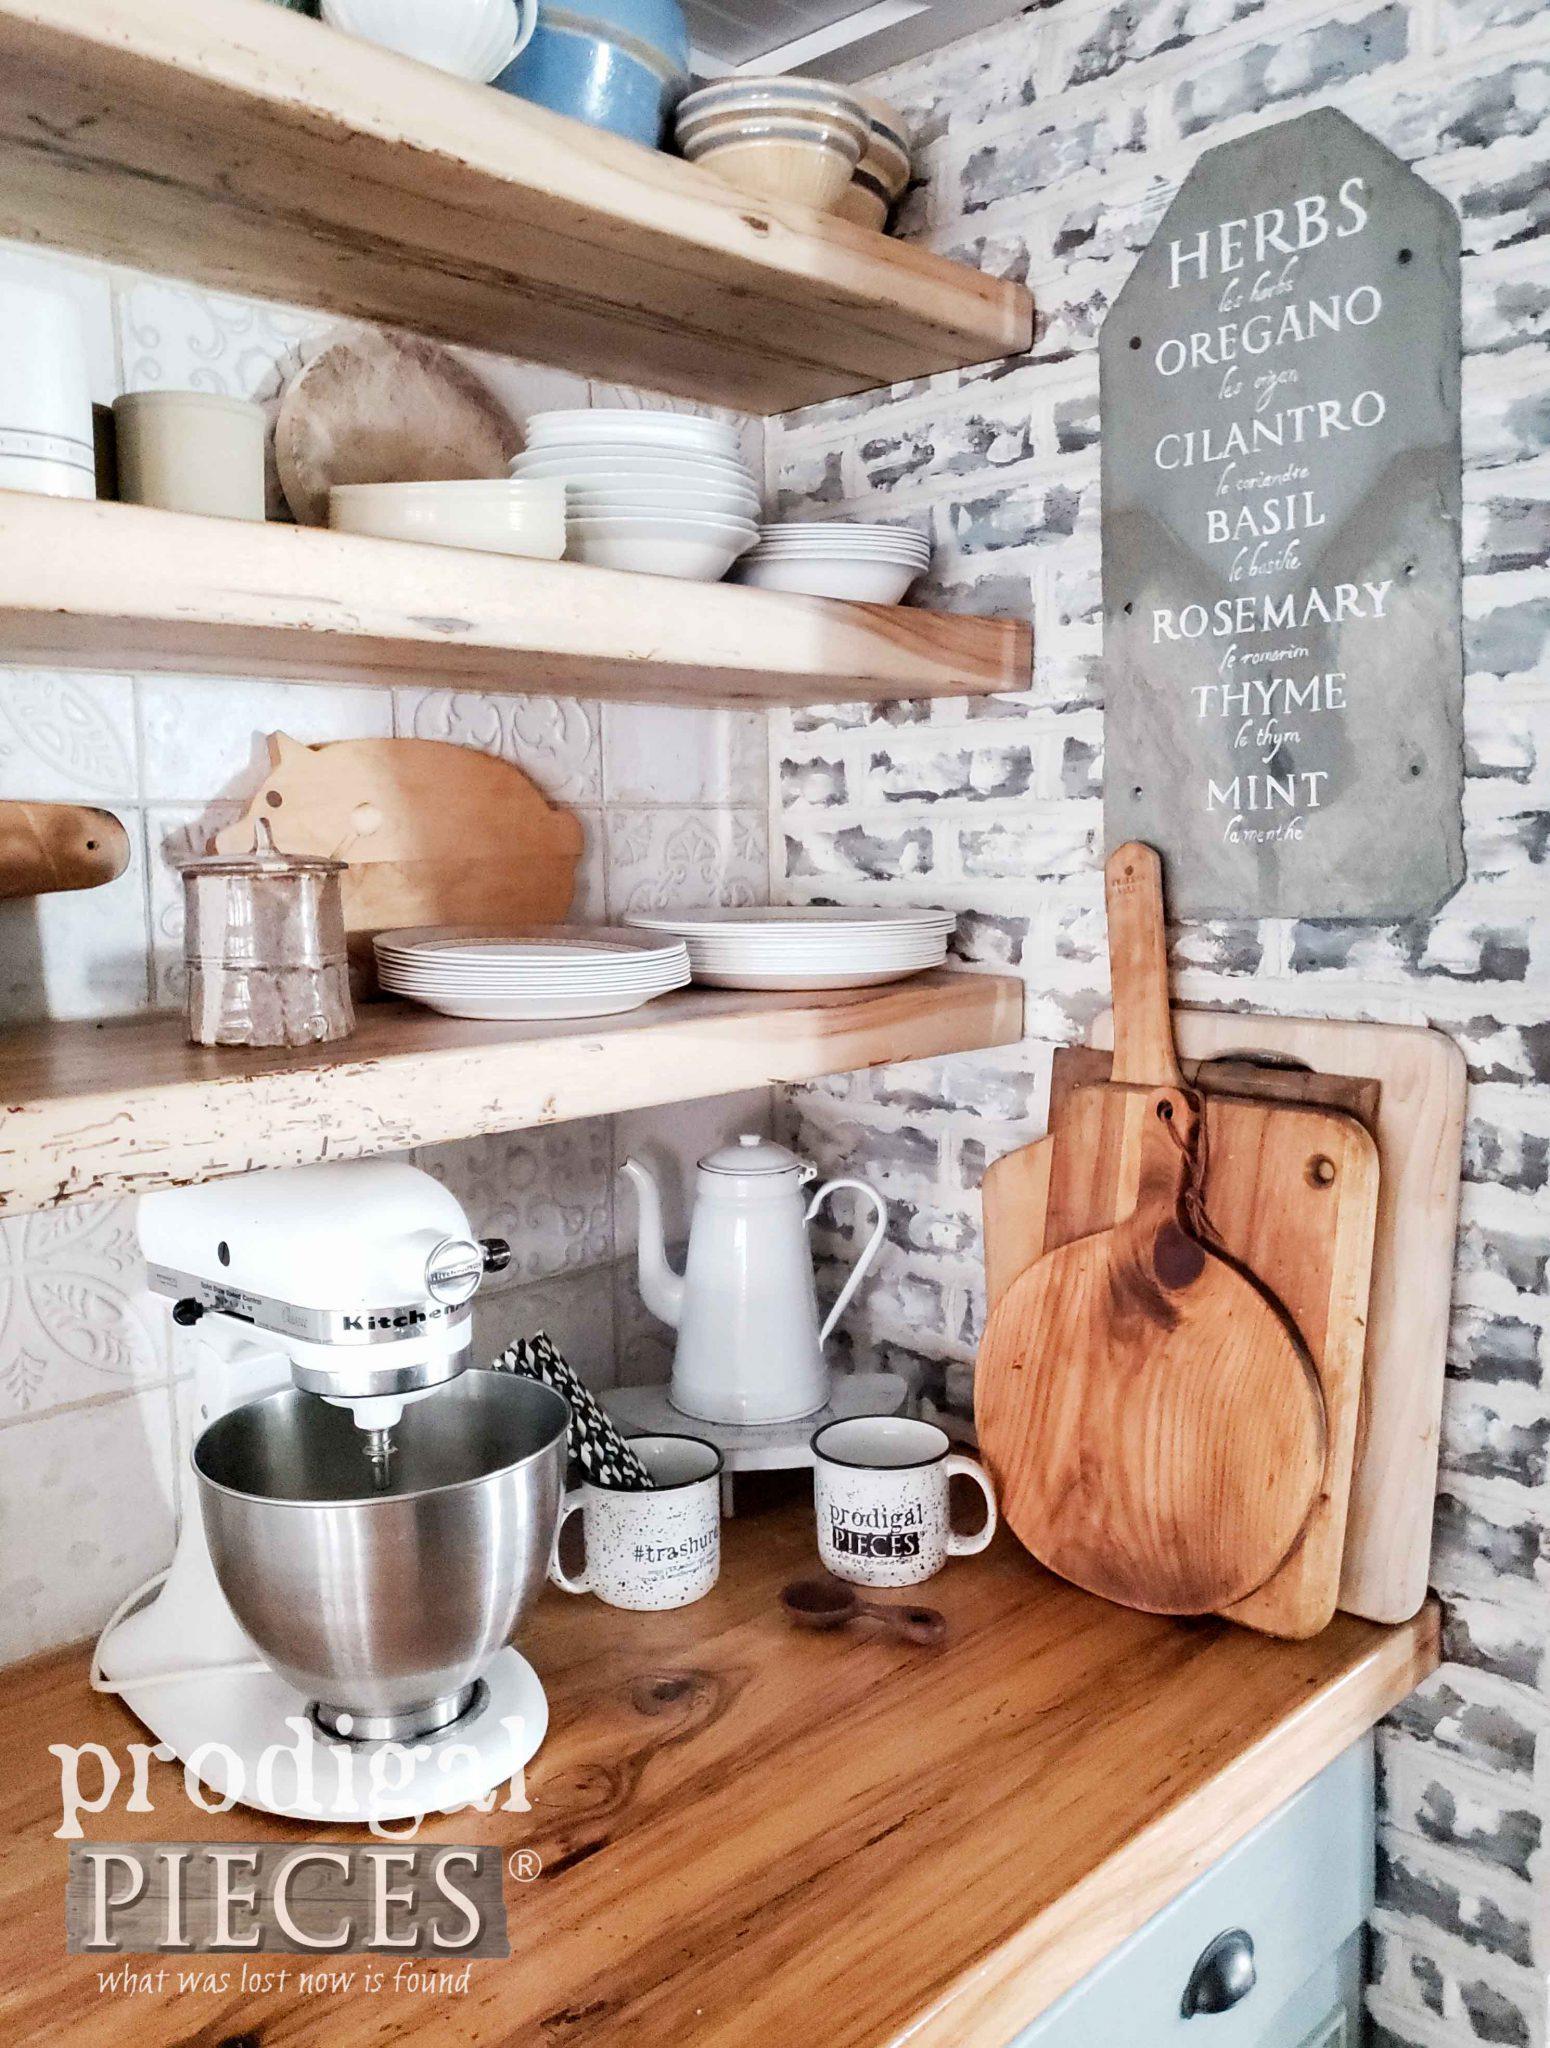 Handmade Farmhouse Kitchen Decor by Larissa of Prodigal Pieces | prodigalpieces.com #prodigalpieces #diy #farmhouse #home #homedecor